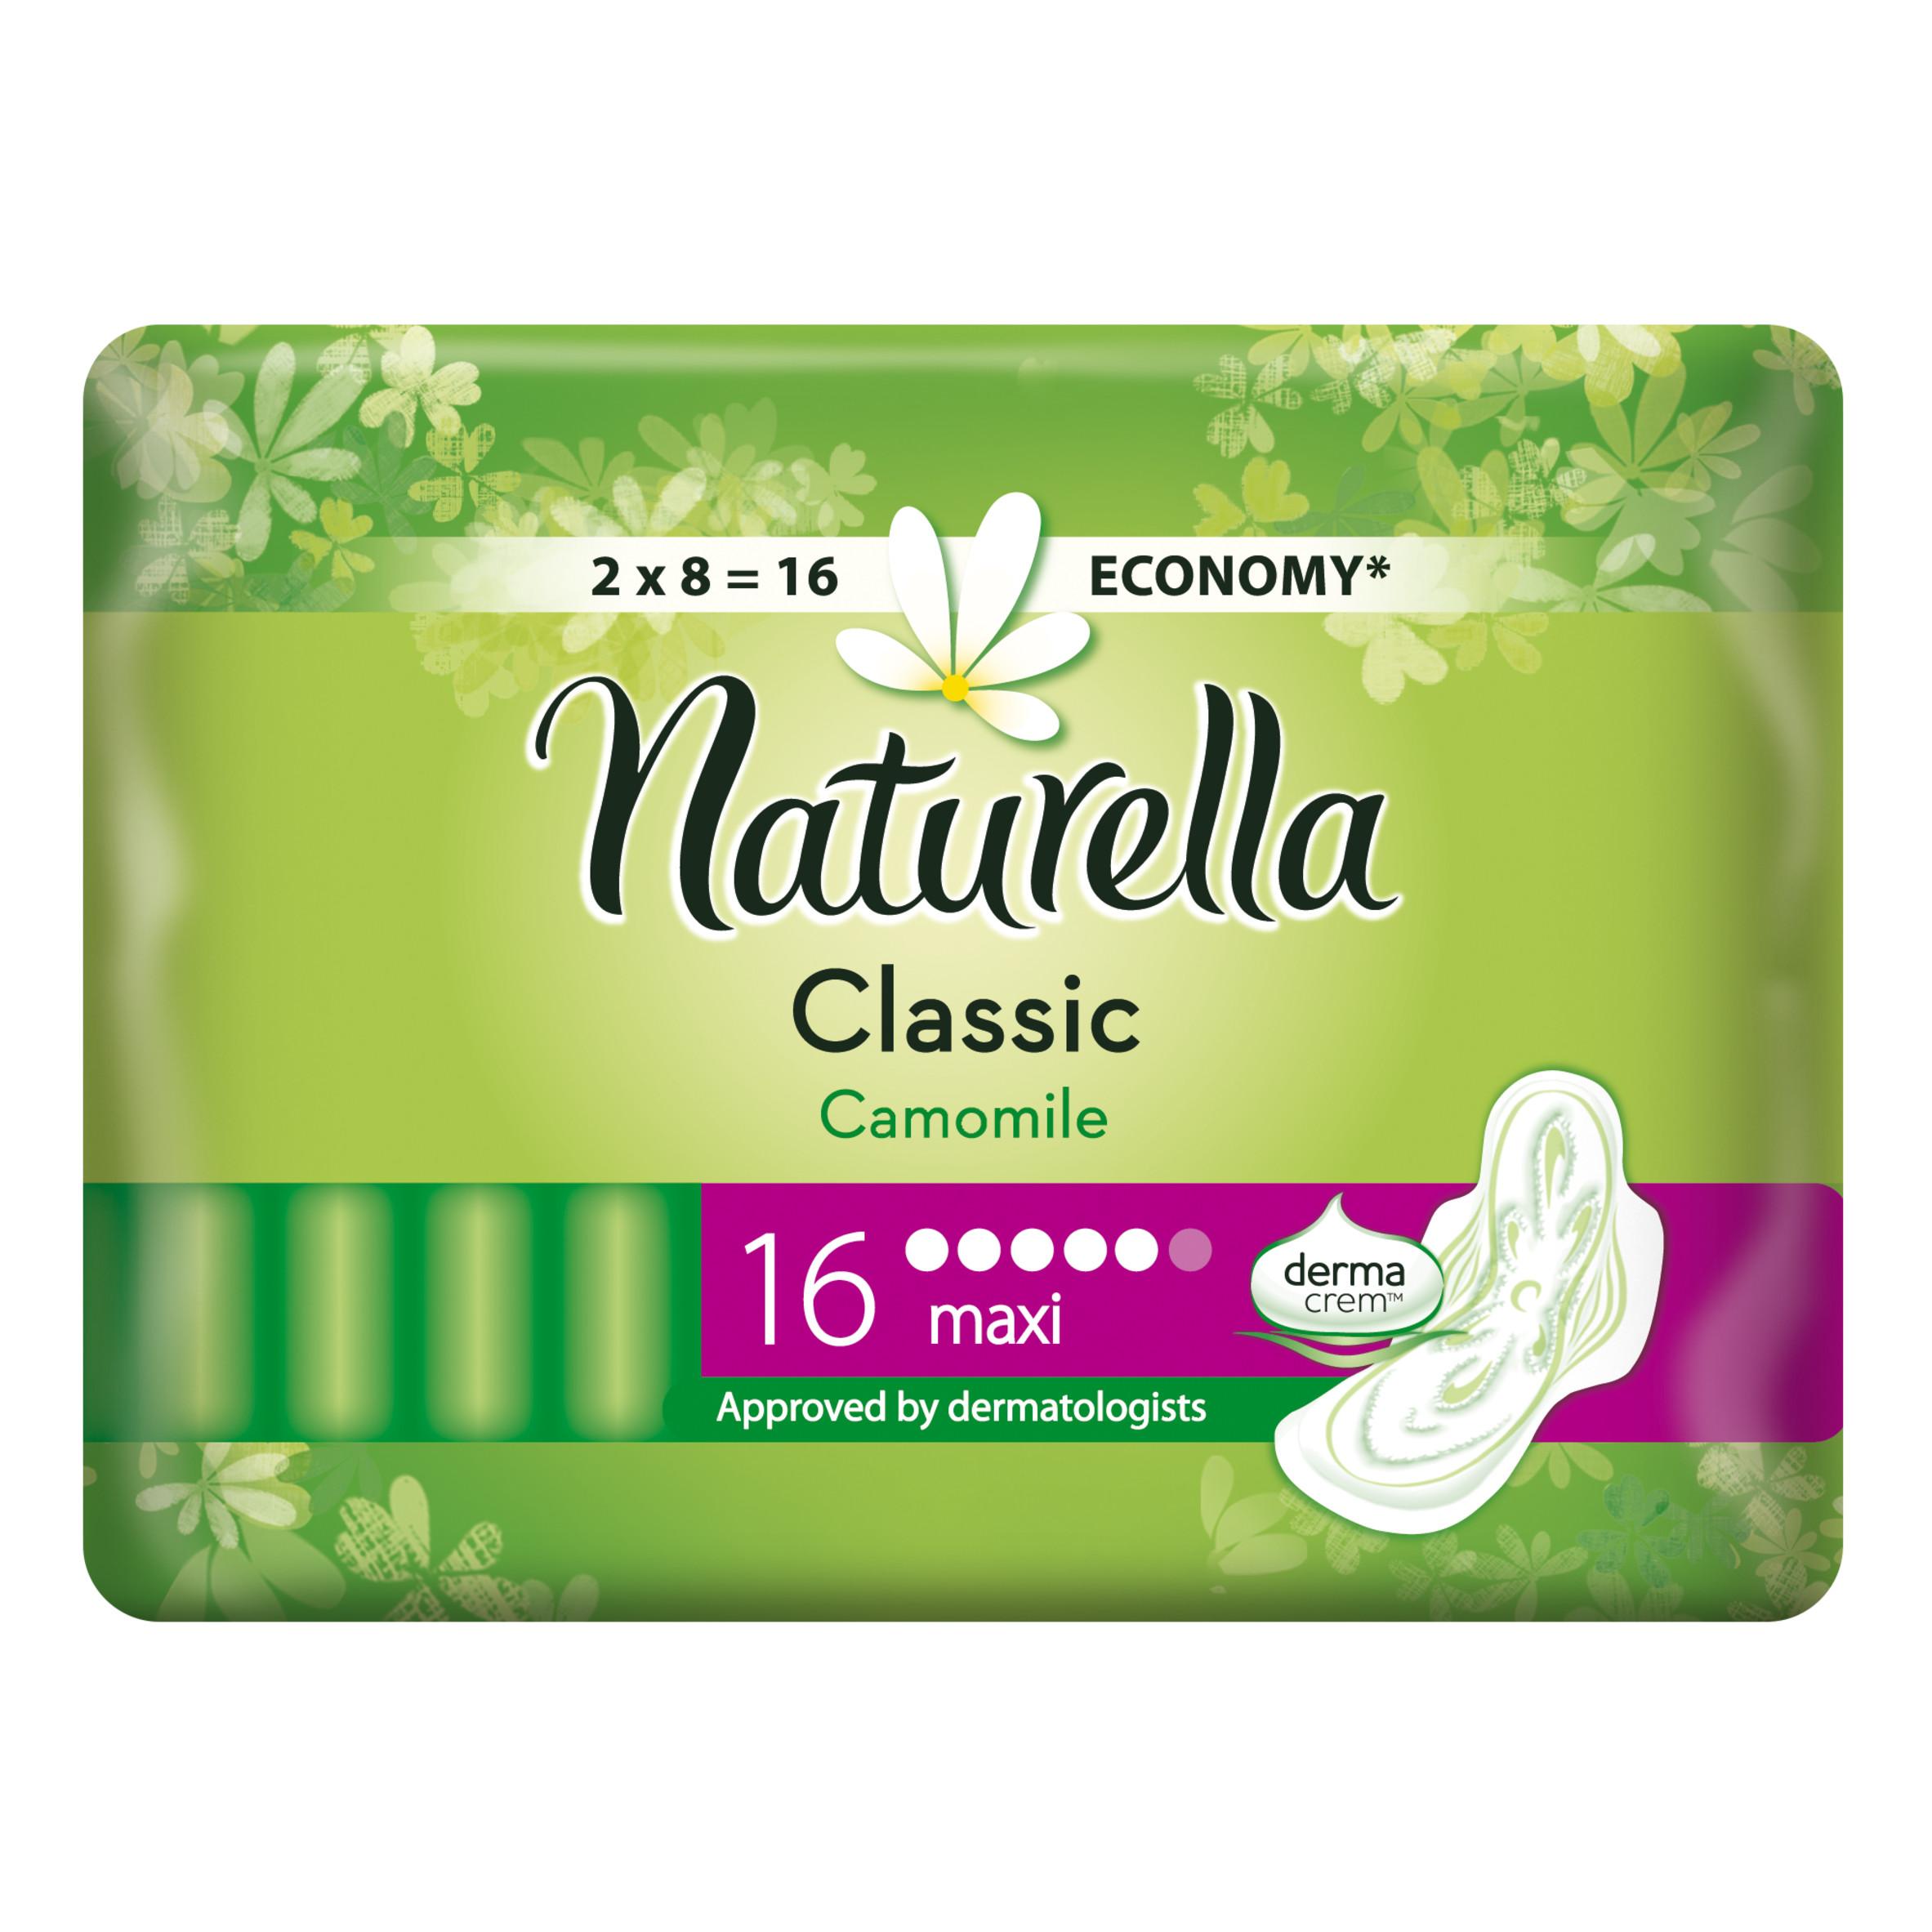 Прокладки гигиенические Naturella Classic Maxi Camomile 16Шт.<br>